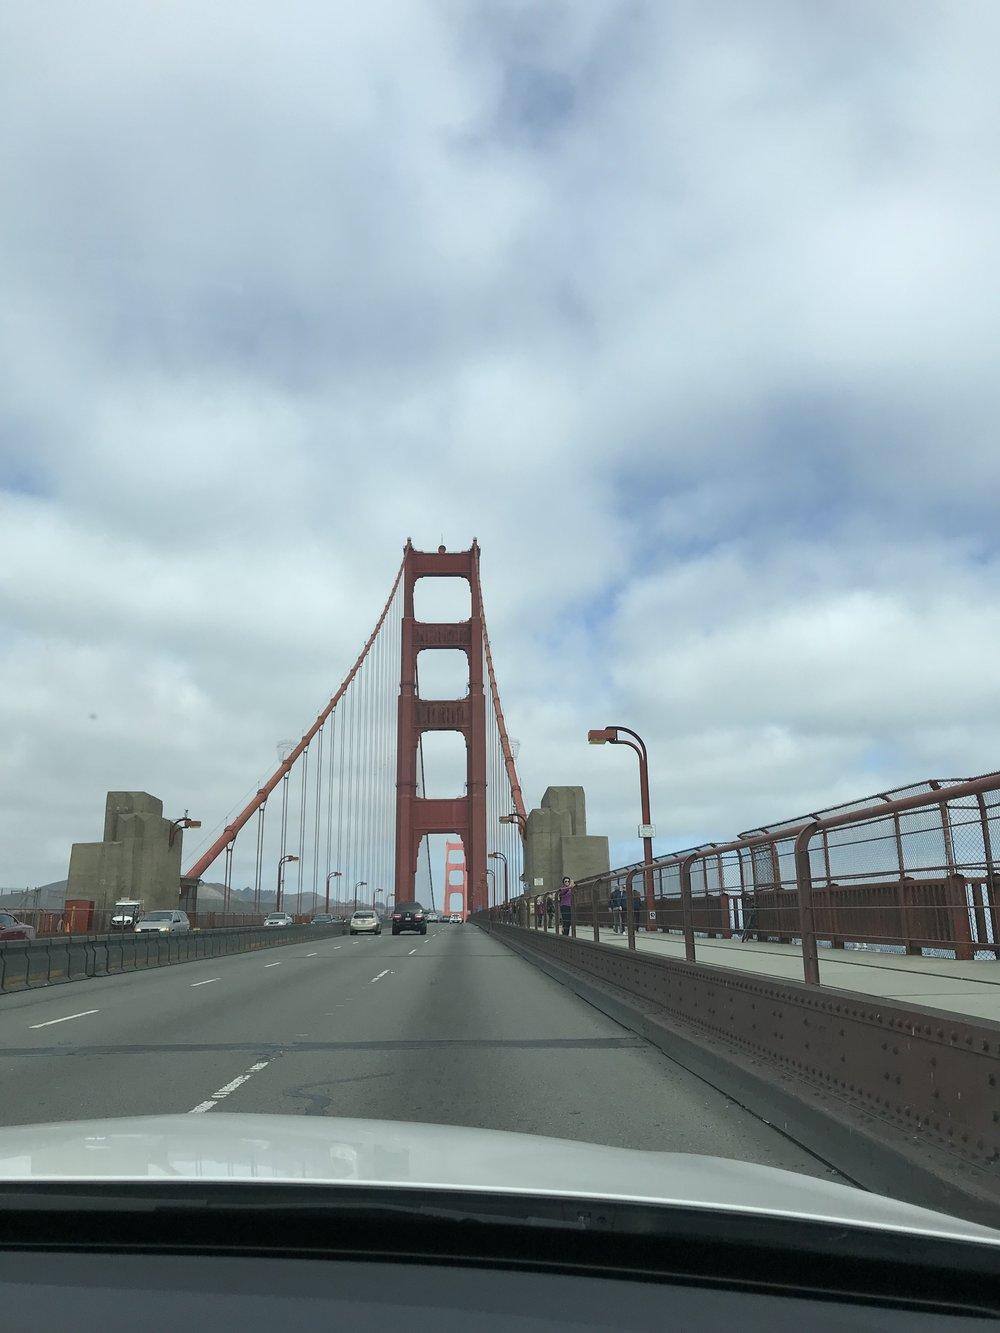 Driving over Golden Gate bridge